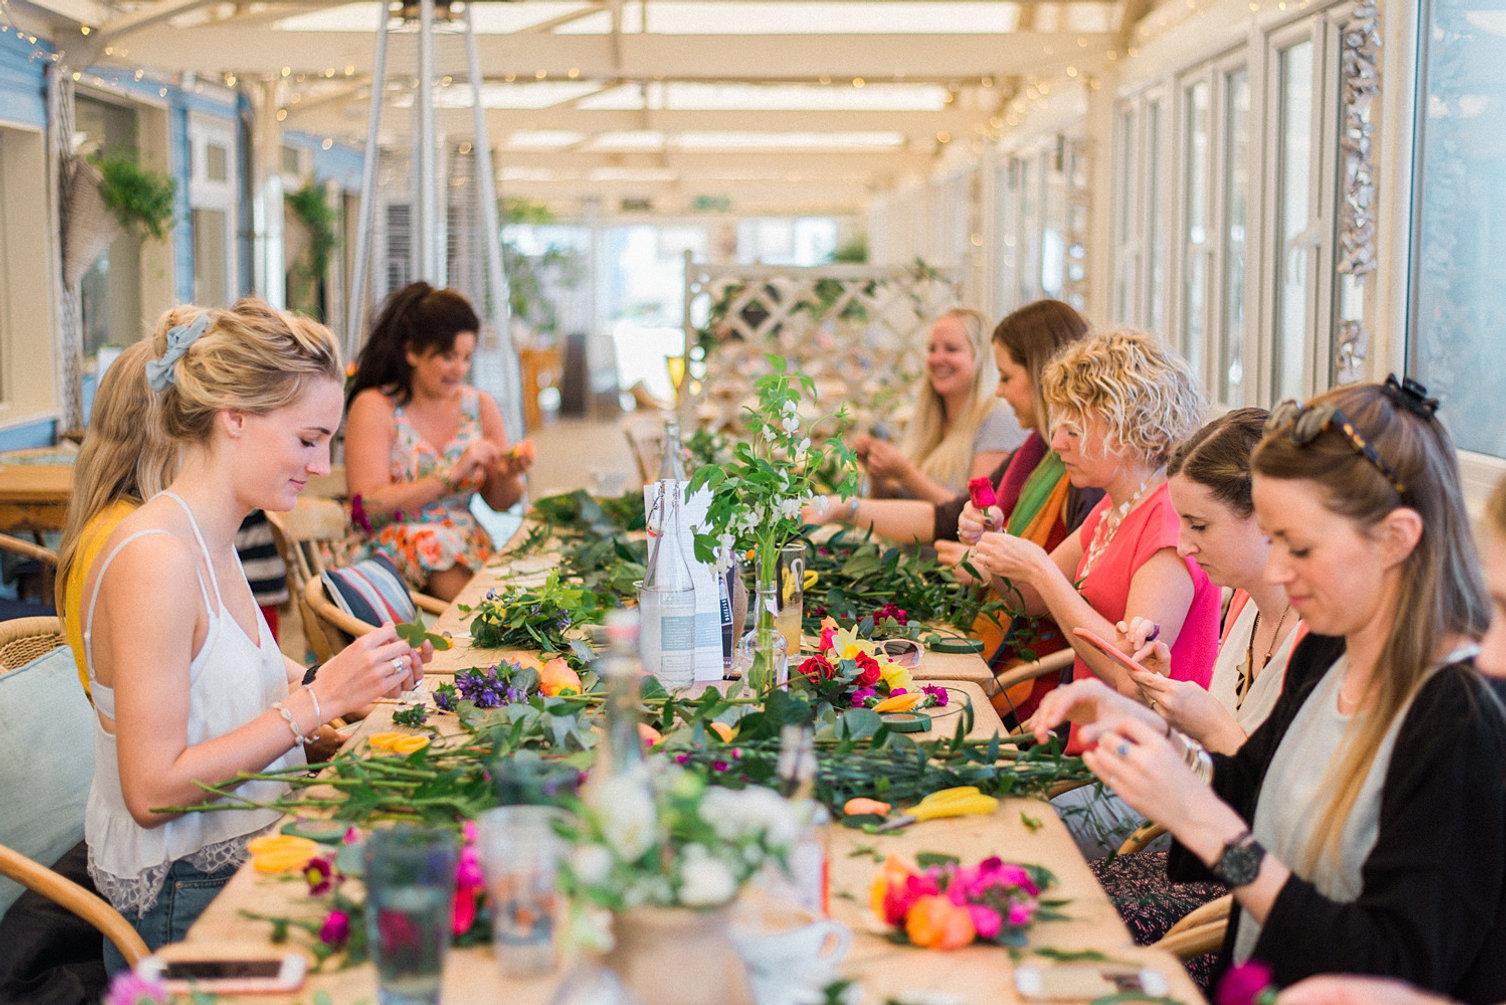 The style eddies flower crown workshop studio brisbane welcome to the style eddies flower crown studio izmirmasajfo Image collections